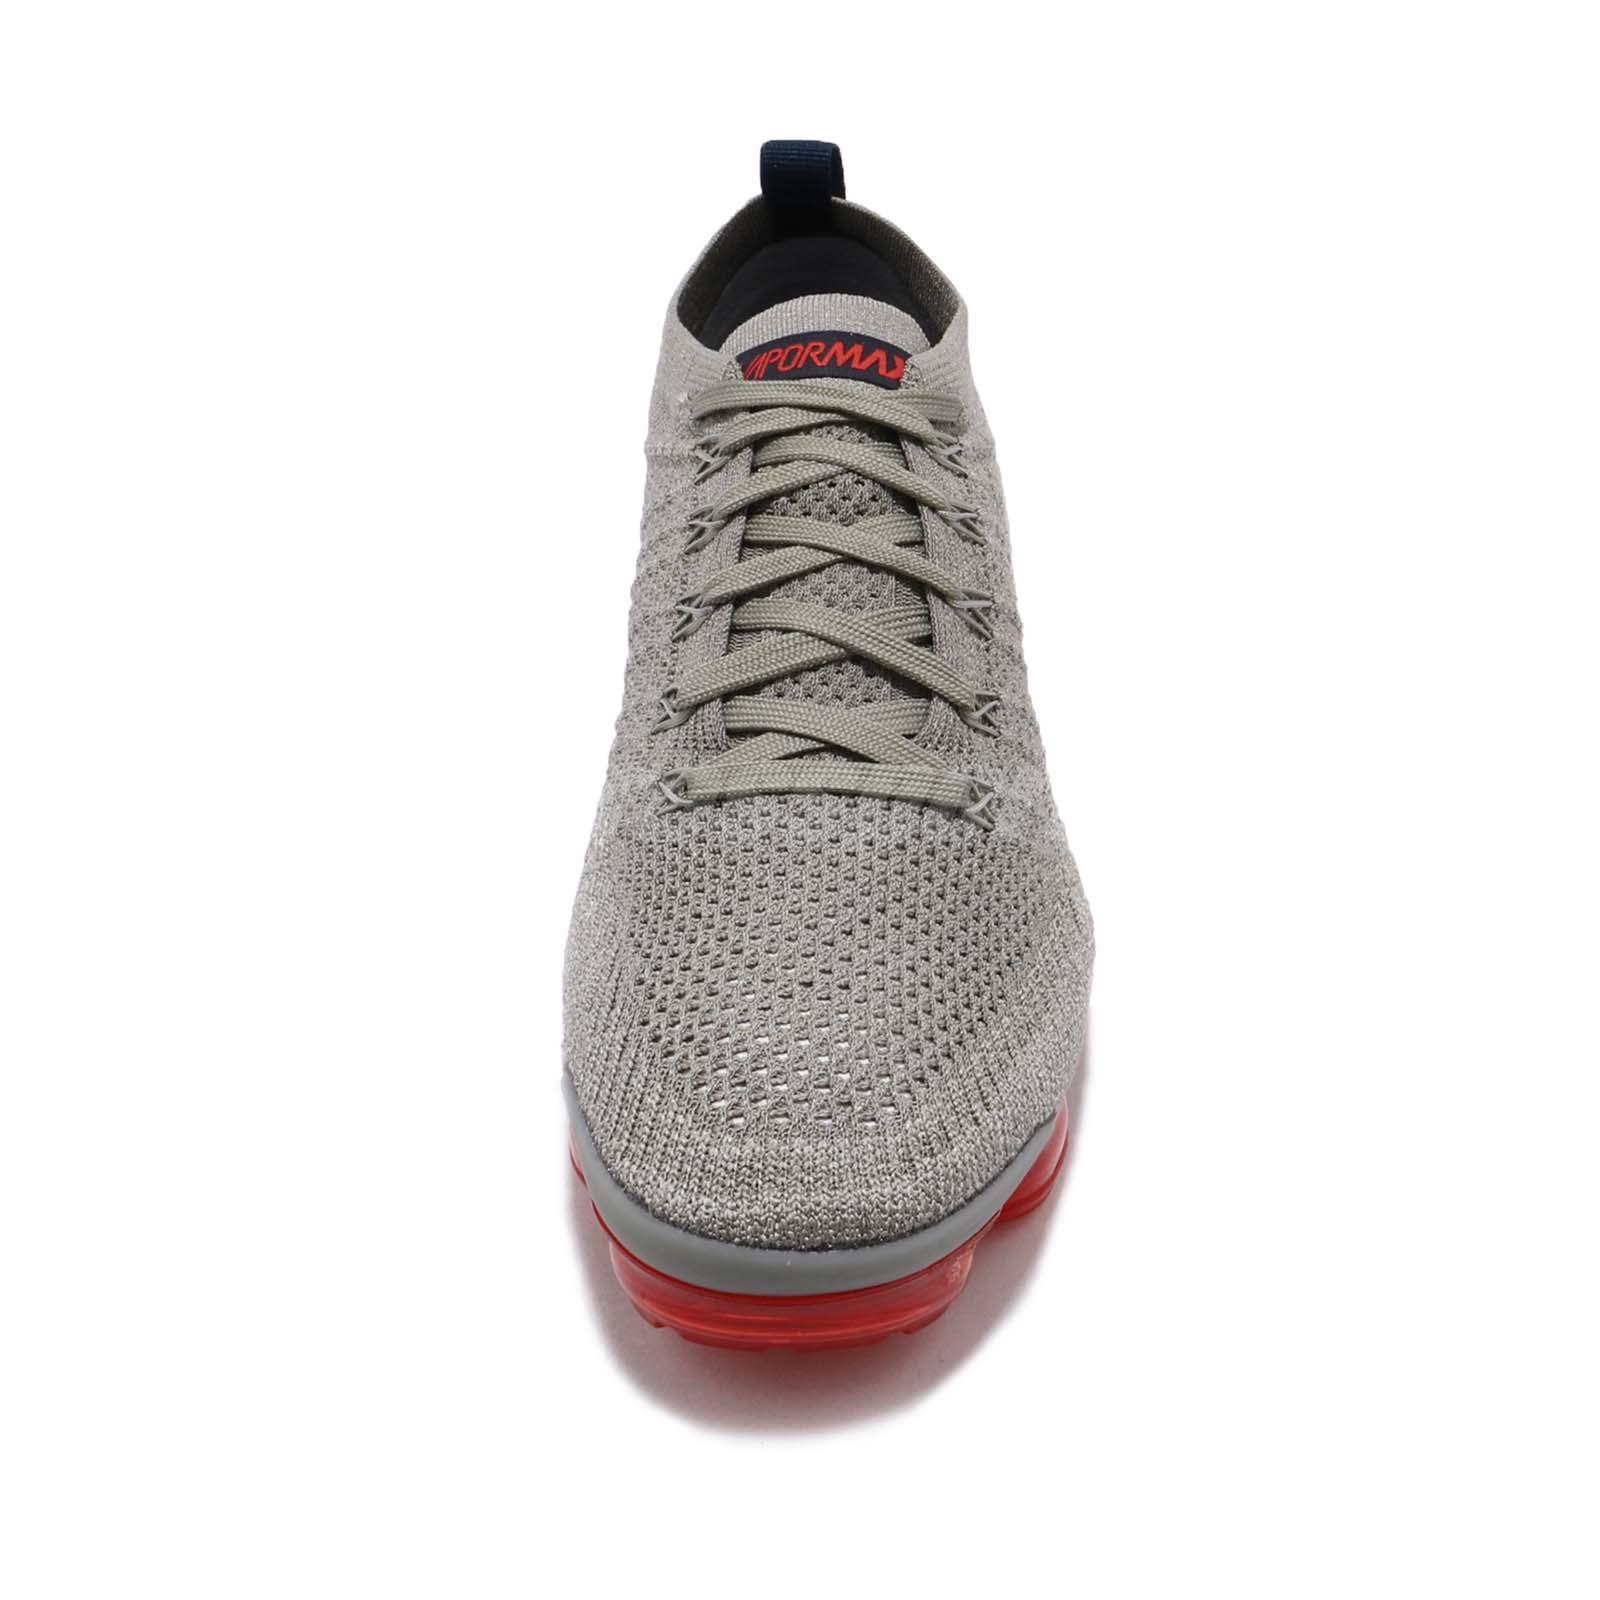 super popular 105e3 3a882 Nike Nike Air Vapormax Flyknit 2 II Dark Stucco Navy Red Men Shoes ...